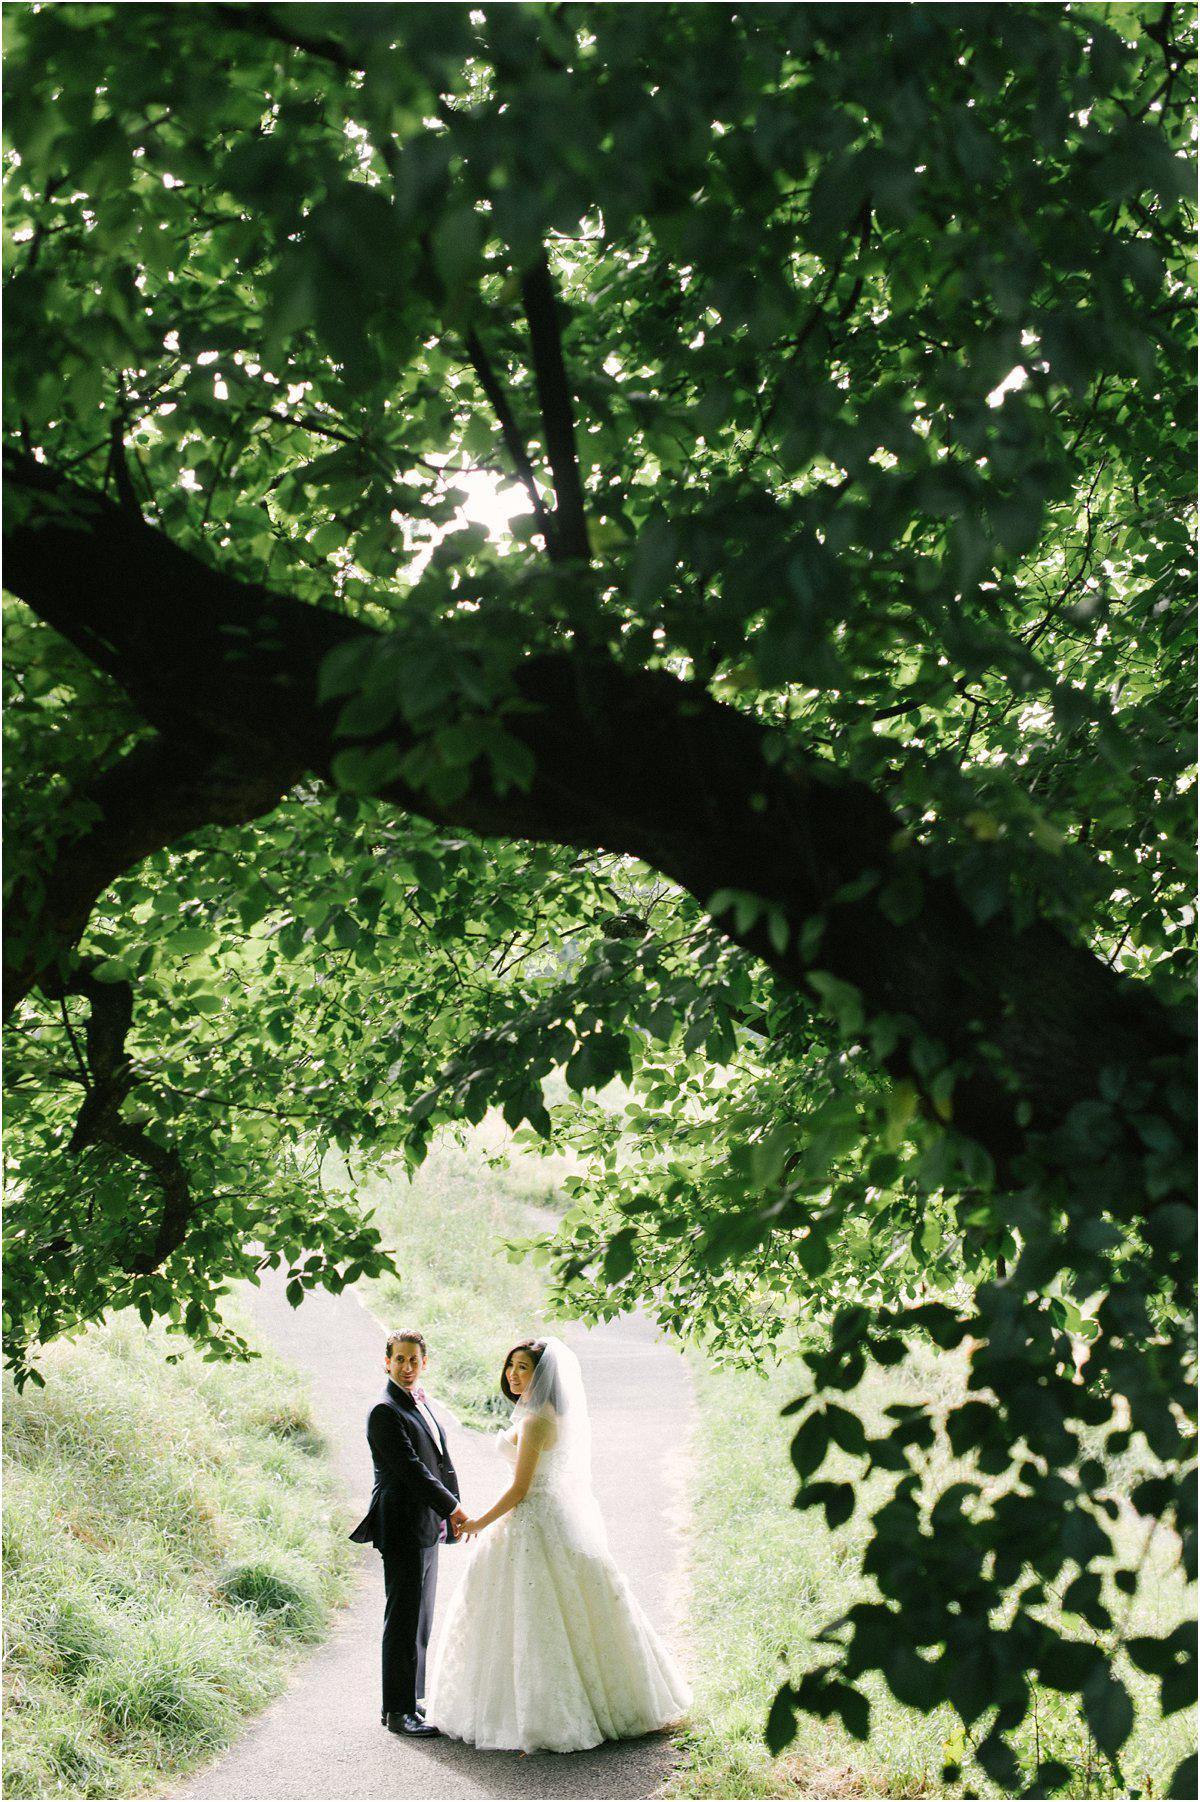 Crofts & Kowalczyk Best Wedding Photography Scotland Blogpost-76.jpg